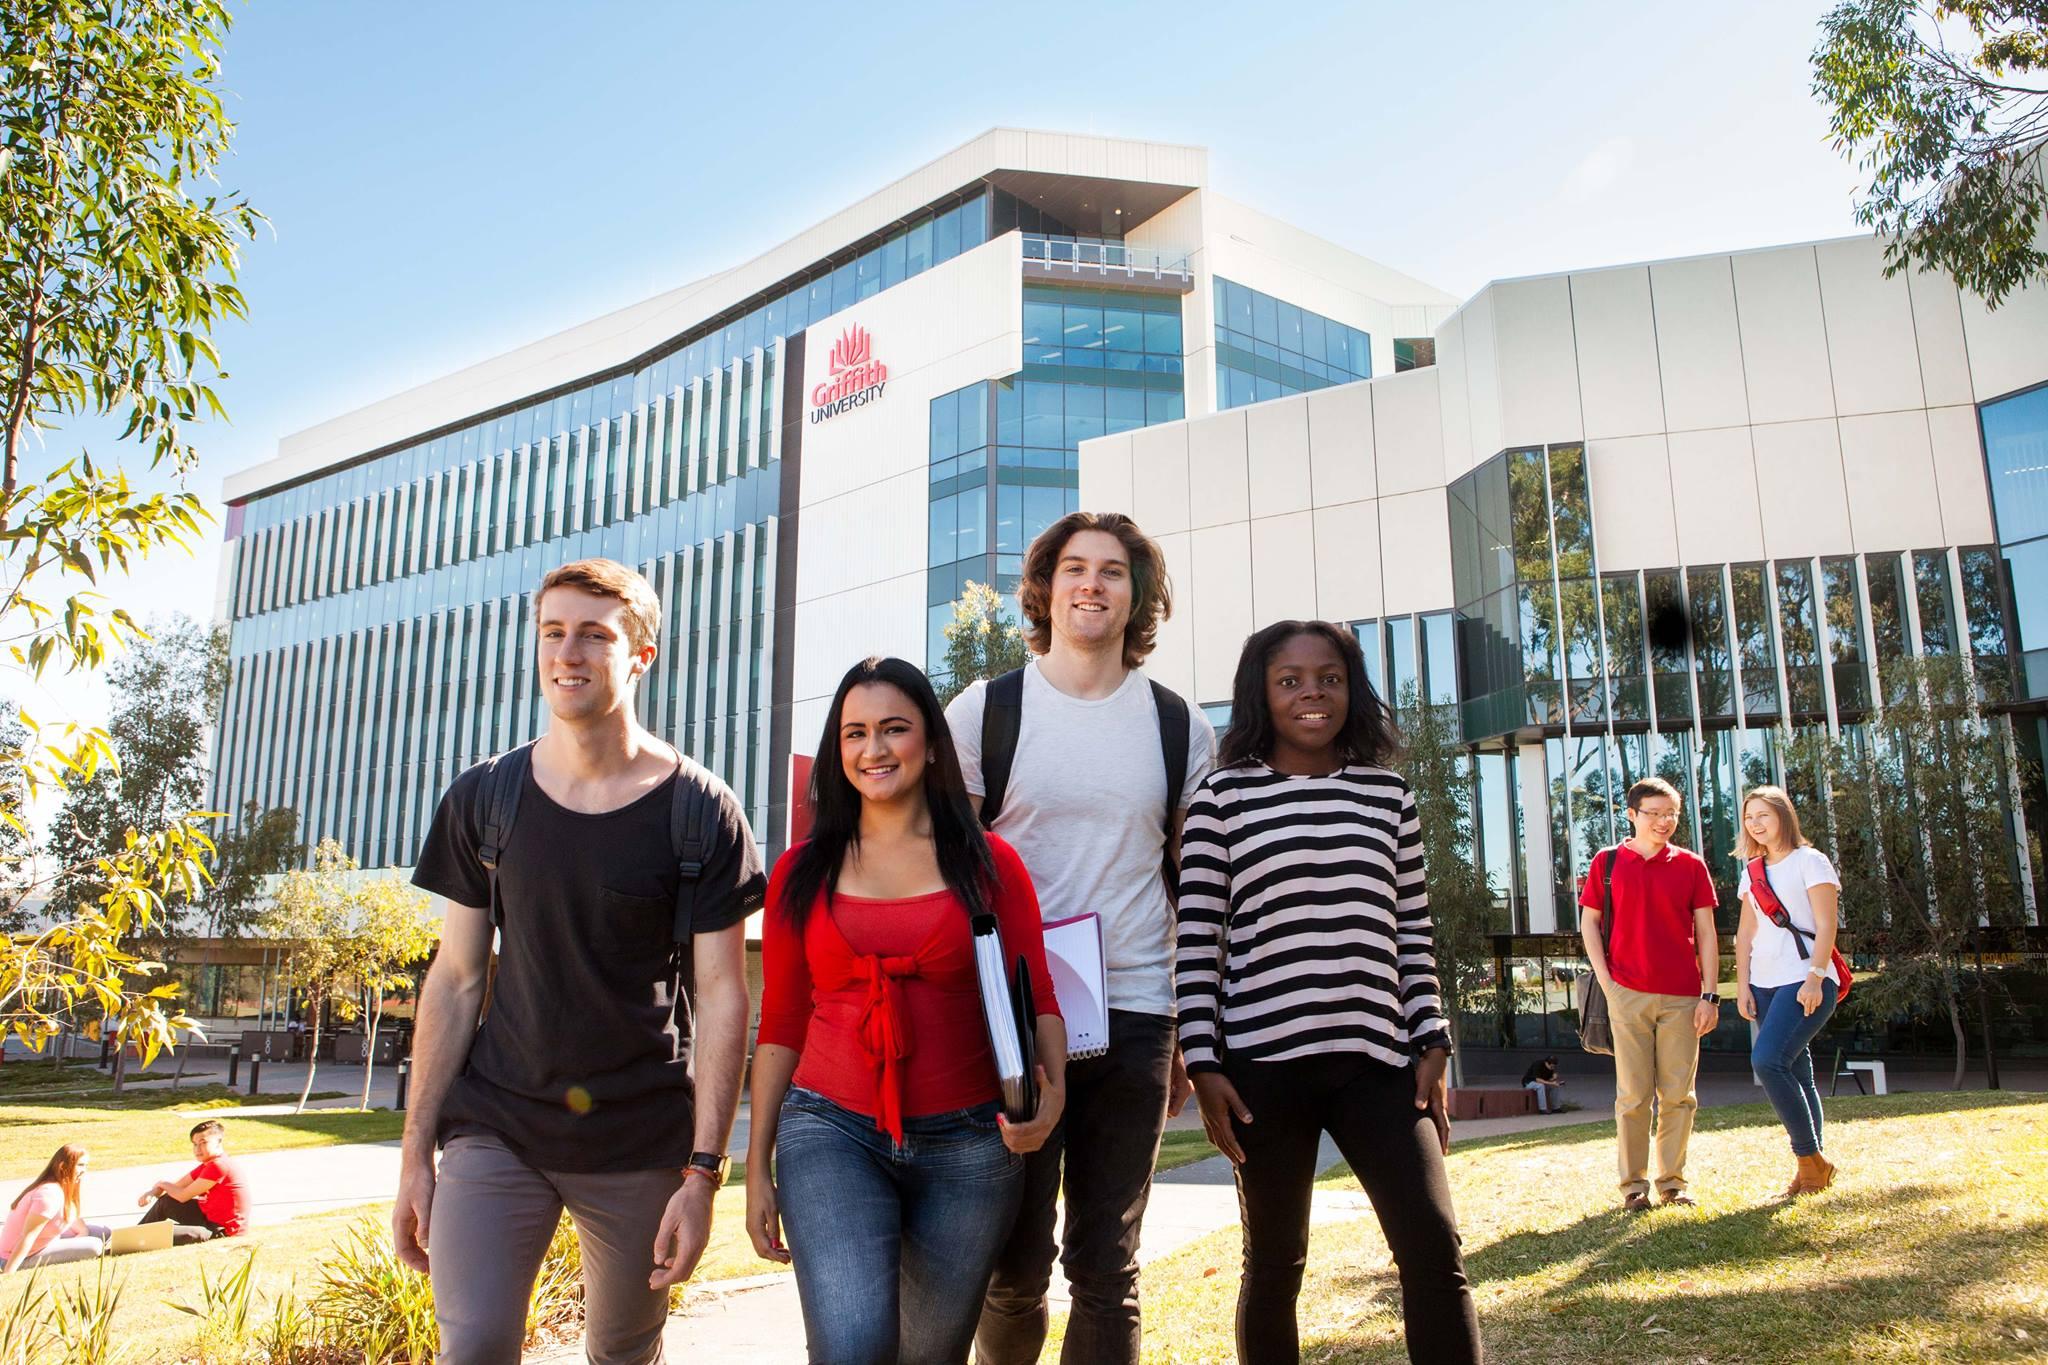 Brisbane universities uni school universities schools technology Queensland Griffith university Southern Australian catholic private best north south